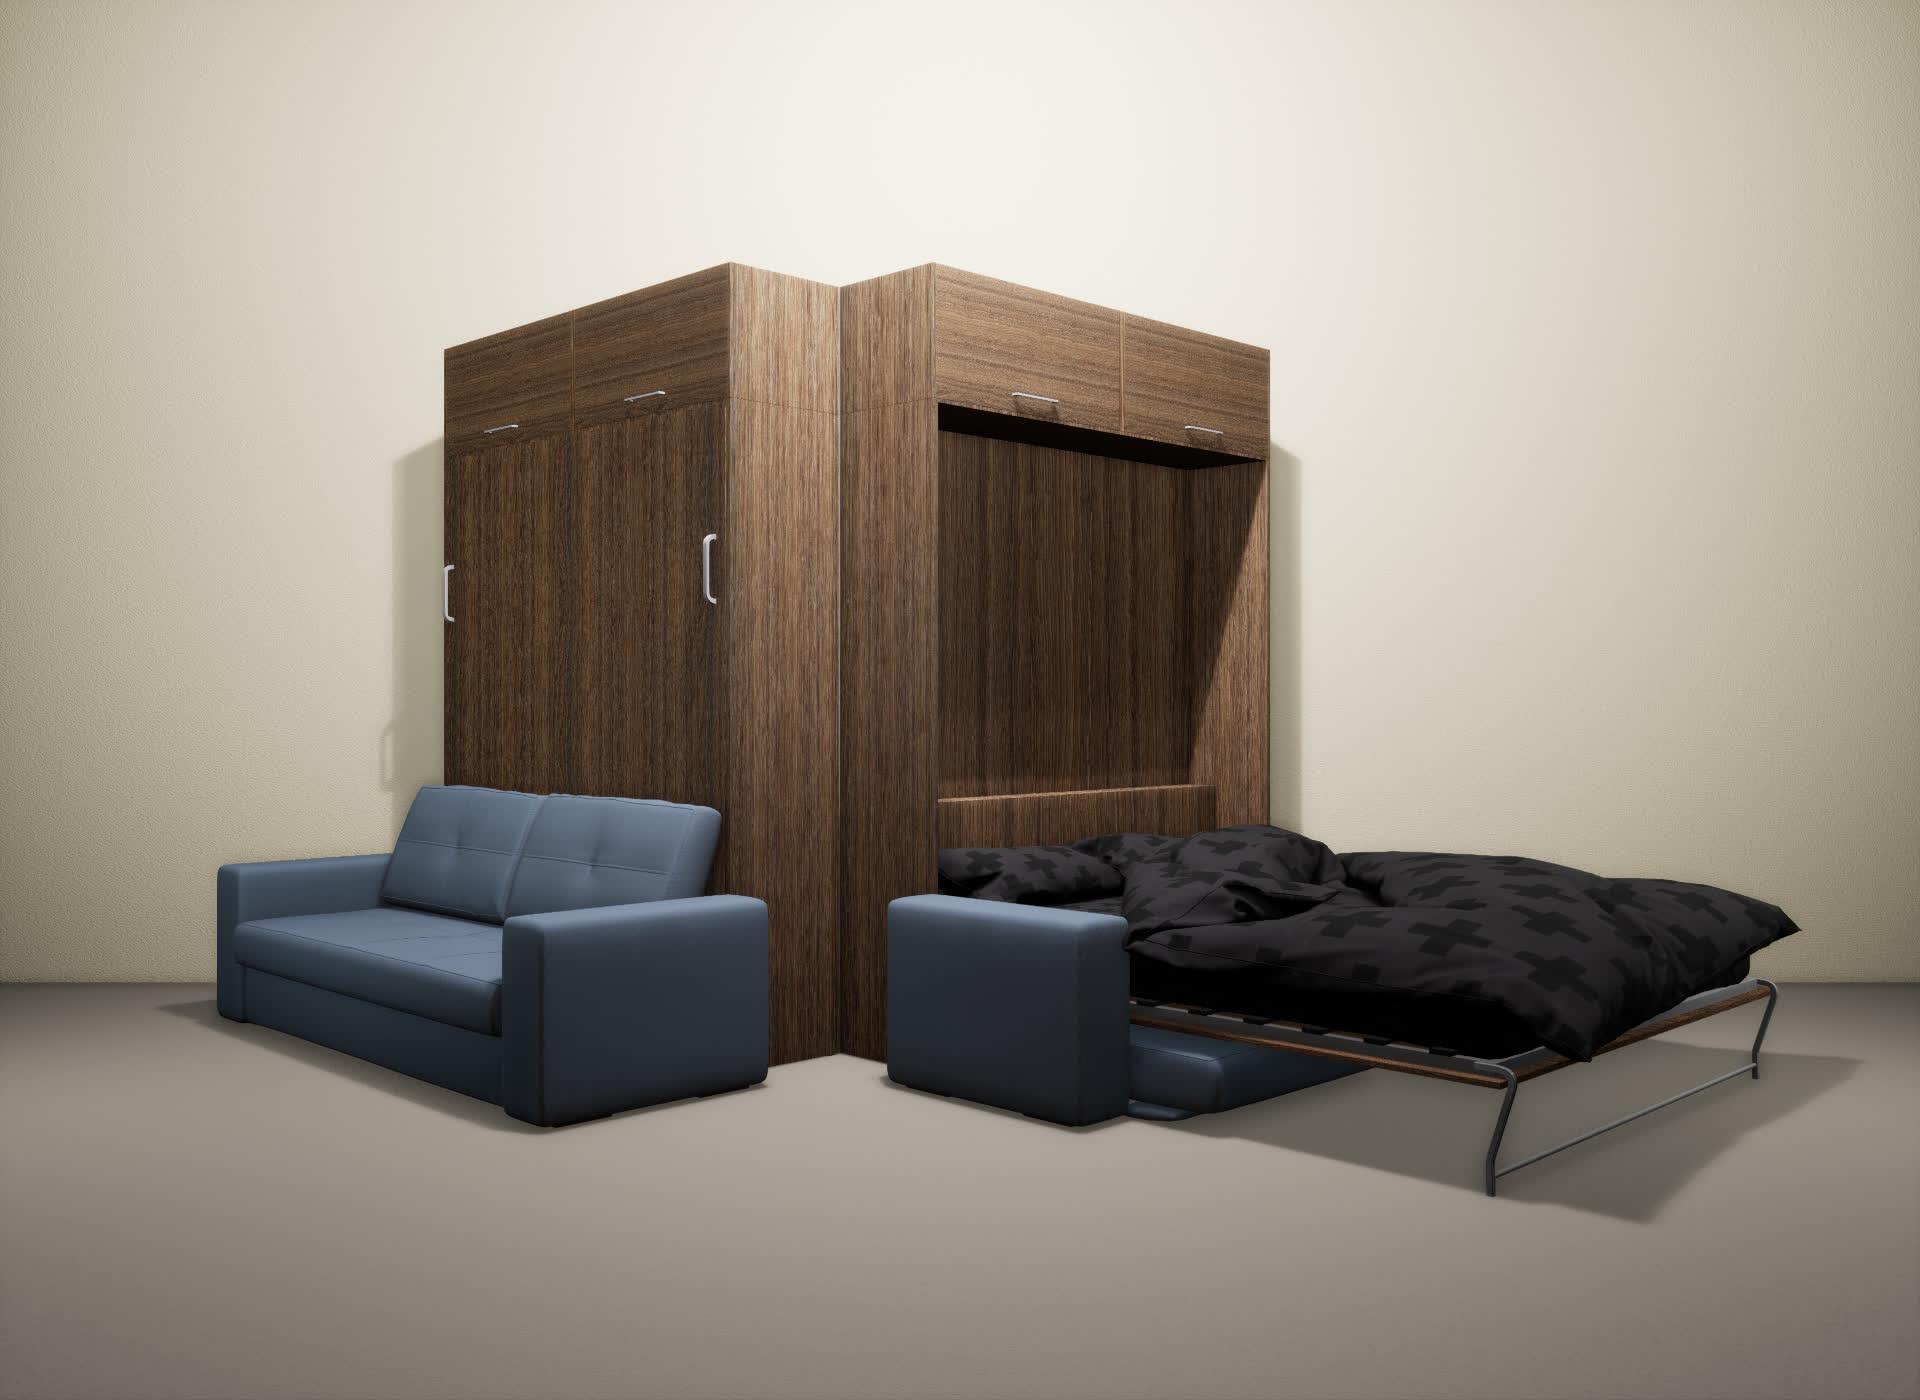 Шкаф-кровать SMART HOME Гамма шамони/шамони